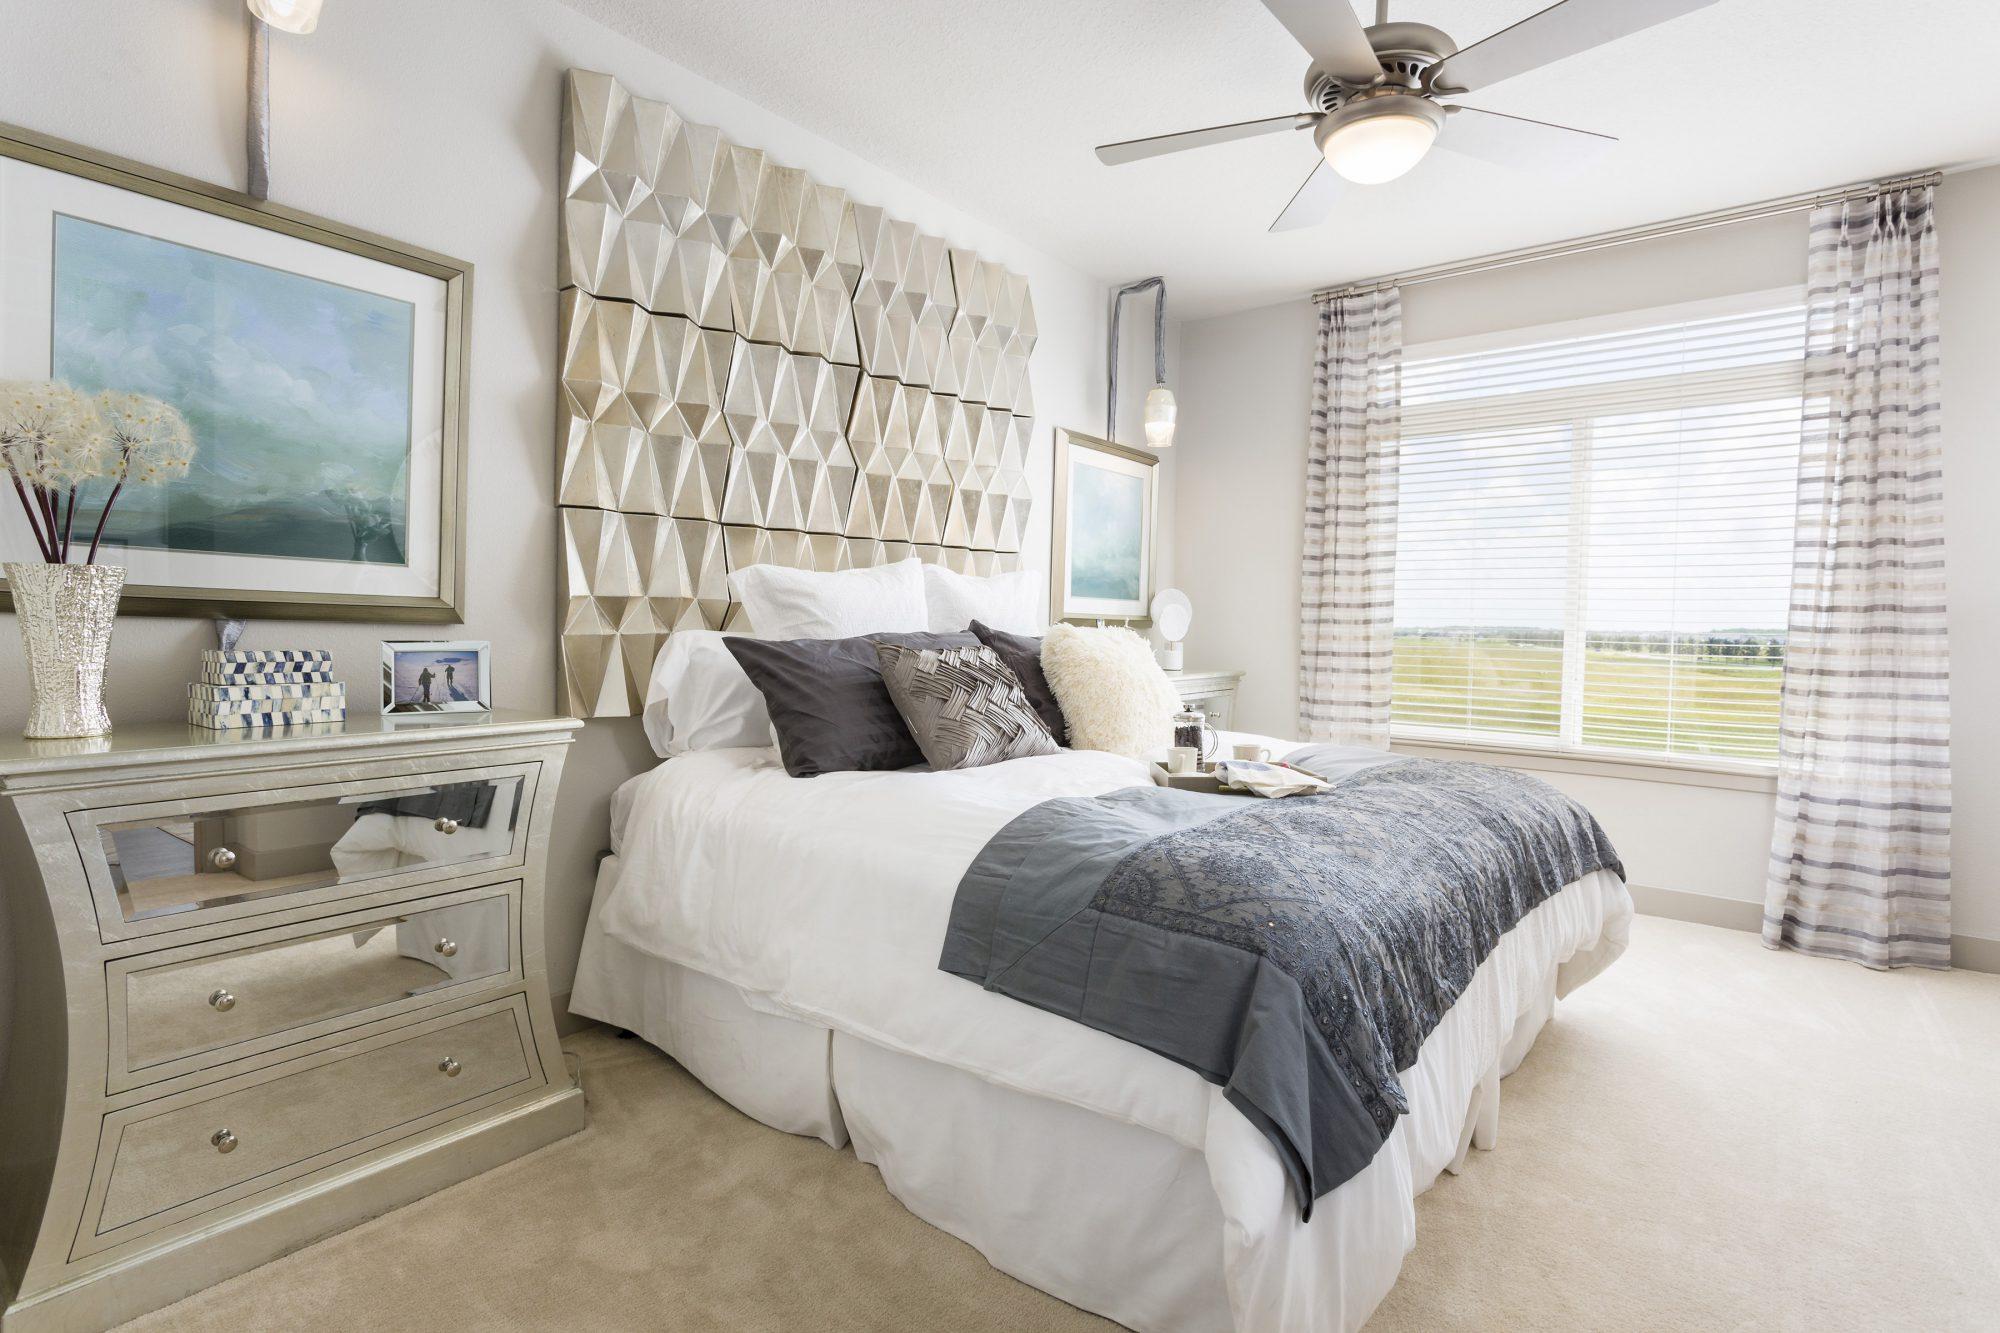 LandonHouse Apartments 5